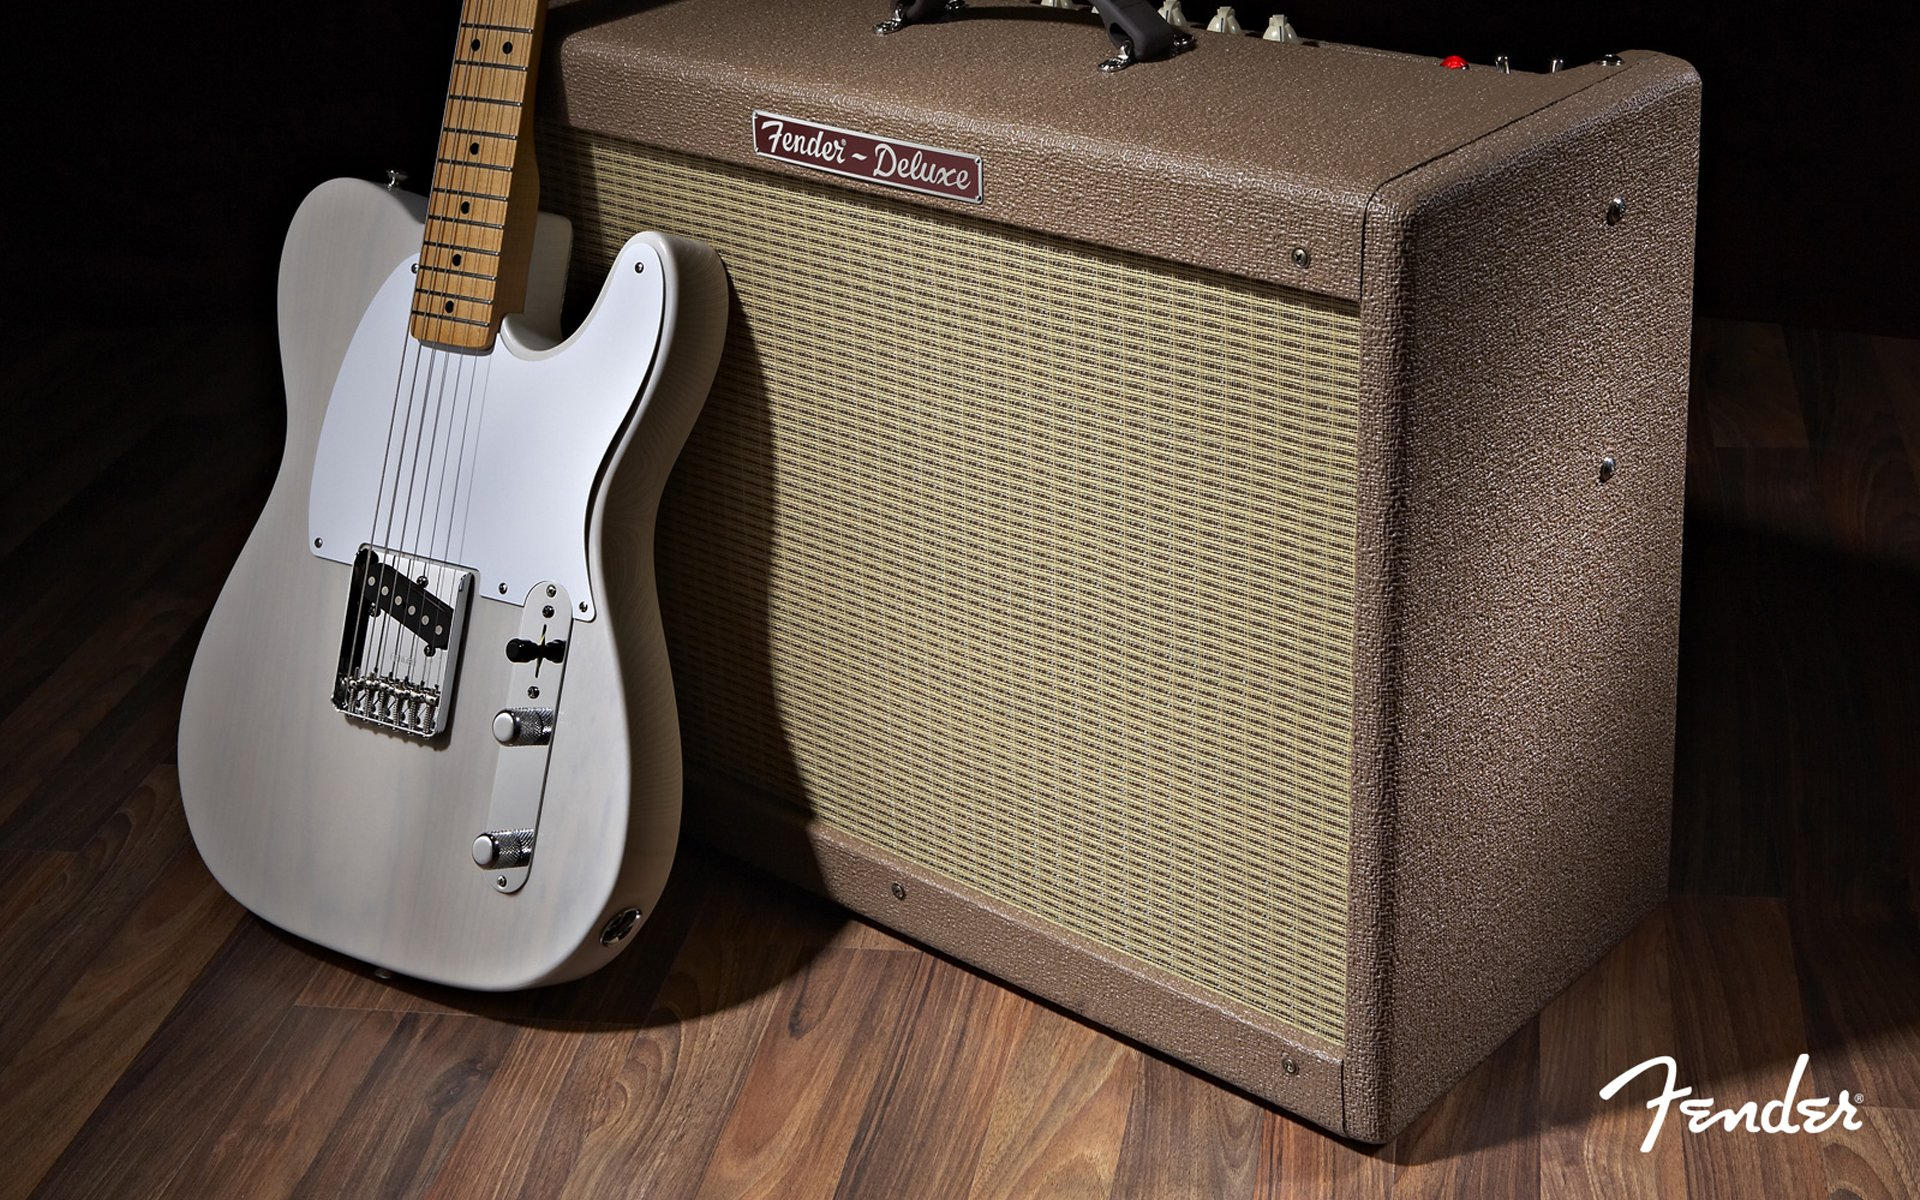 Fender Guitar Wallpaper wallpaper Fender Guitar Wallpaper hd 1920x1200